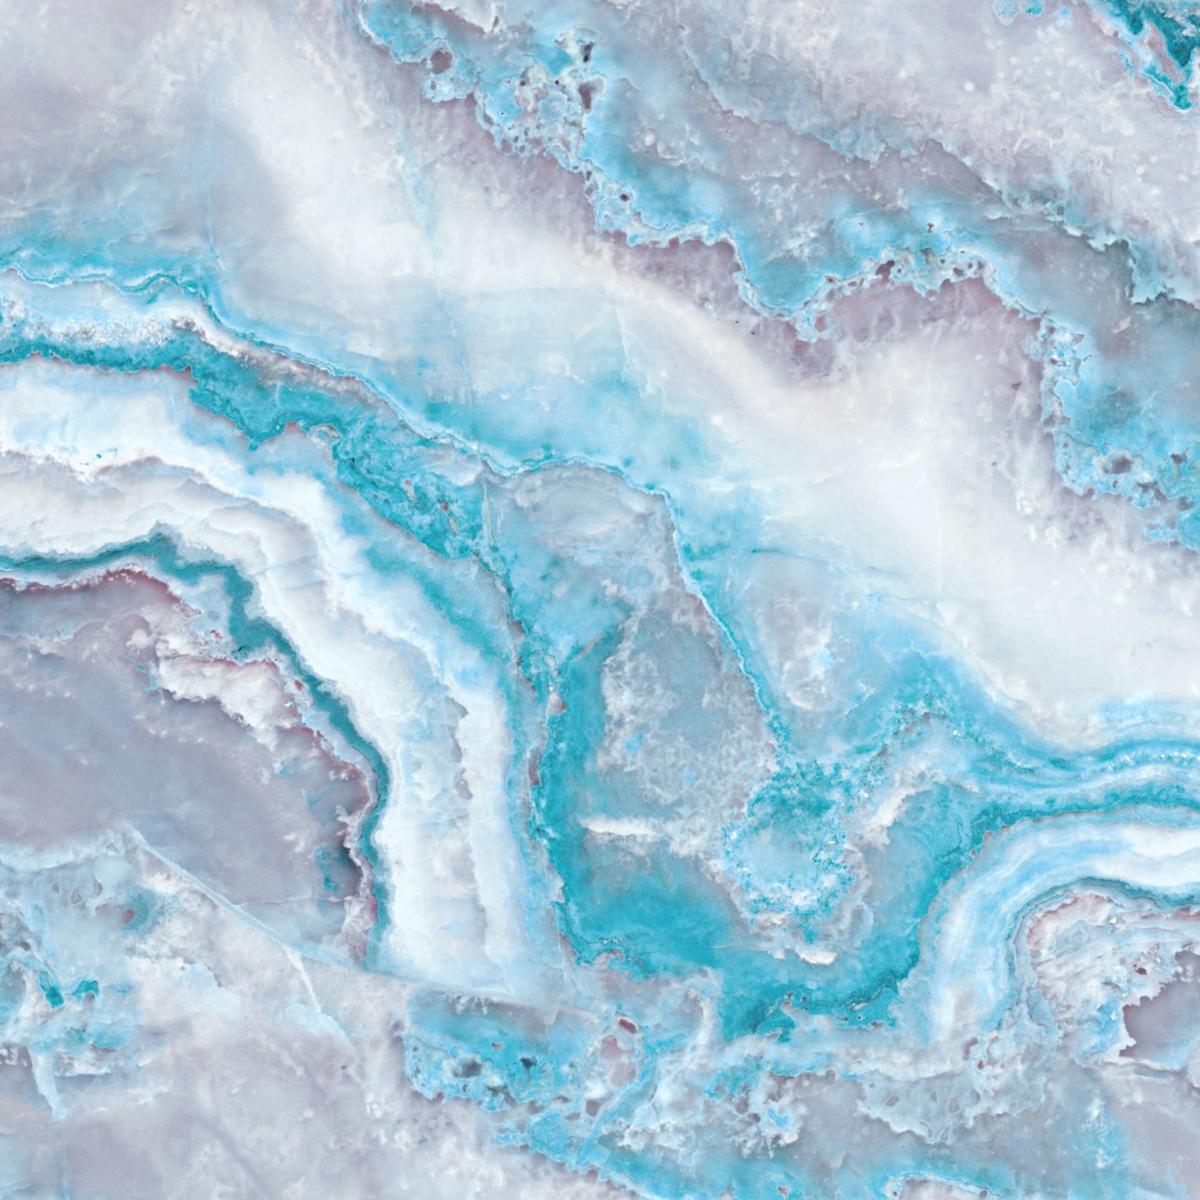 Wallpapers For Computer Cute Trendy Blue Mermaid Ocean Marble Tapet Fototapet Happywall